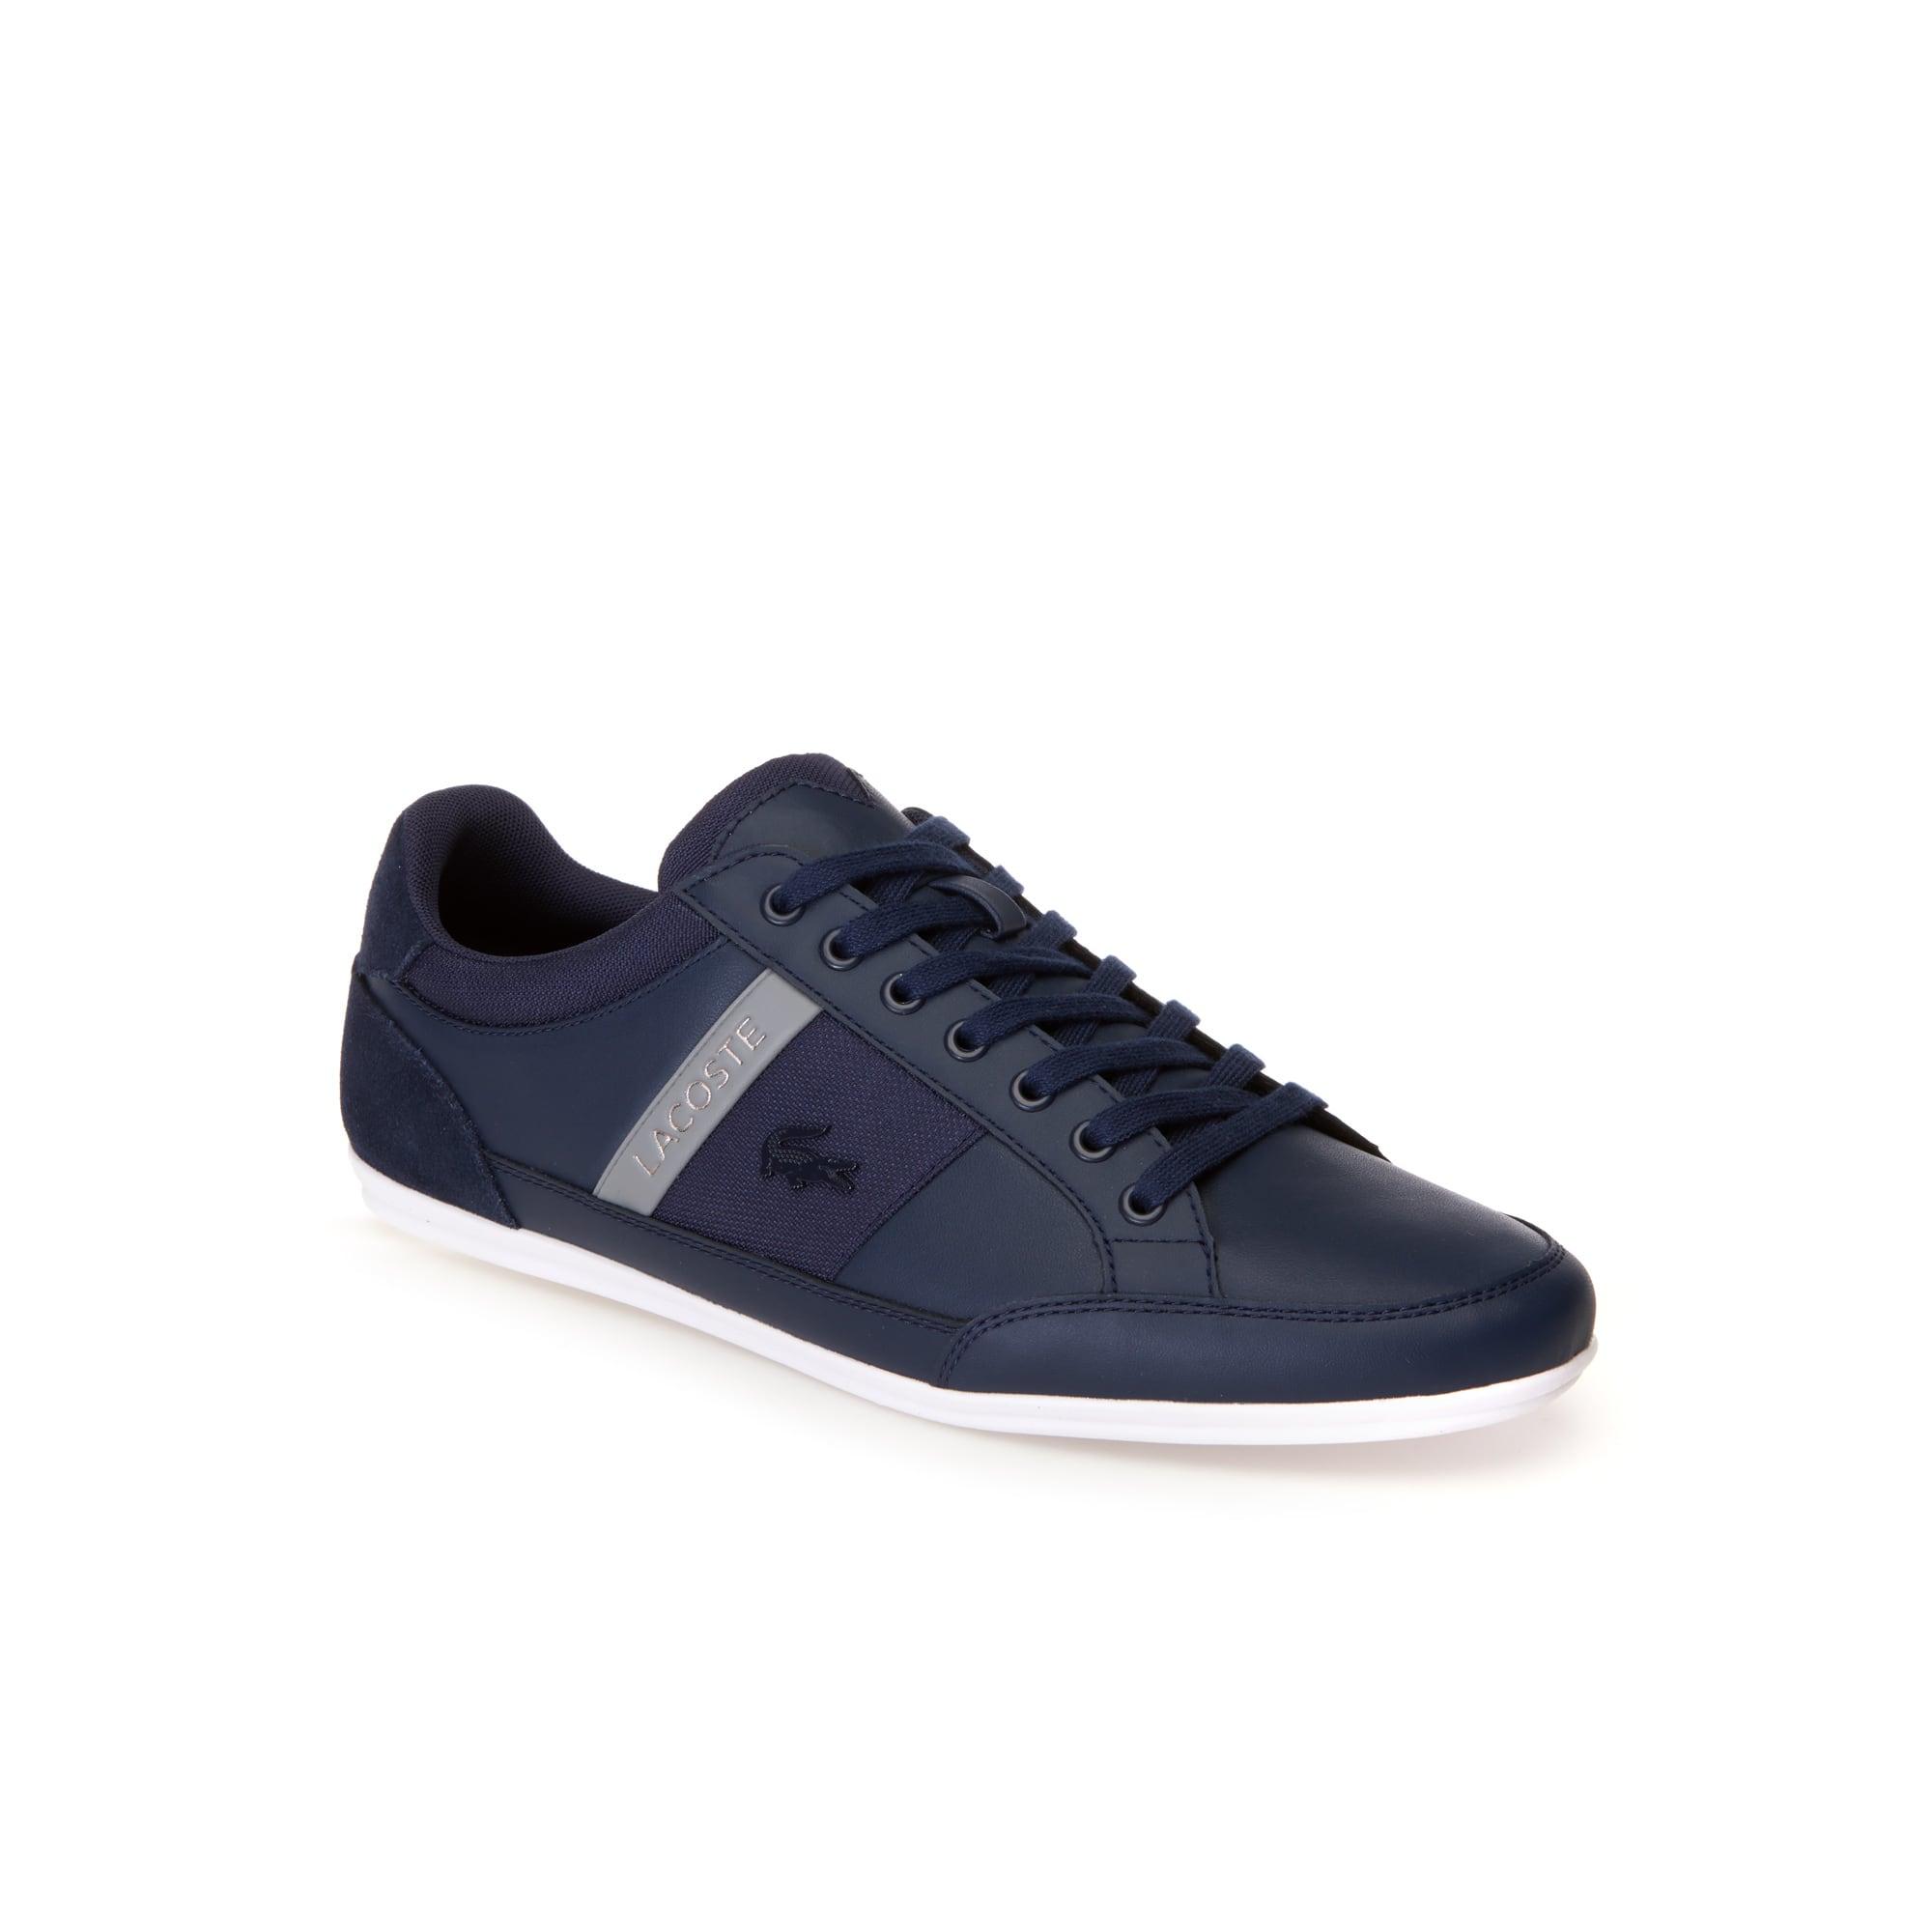 Herren-Sneakers CHAYMON aus Ton-in-Ton Nappa- und Veloursleder